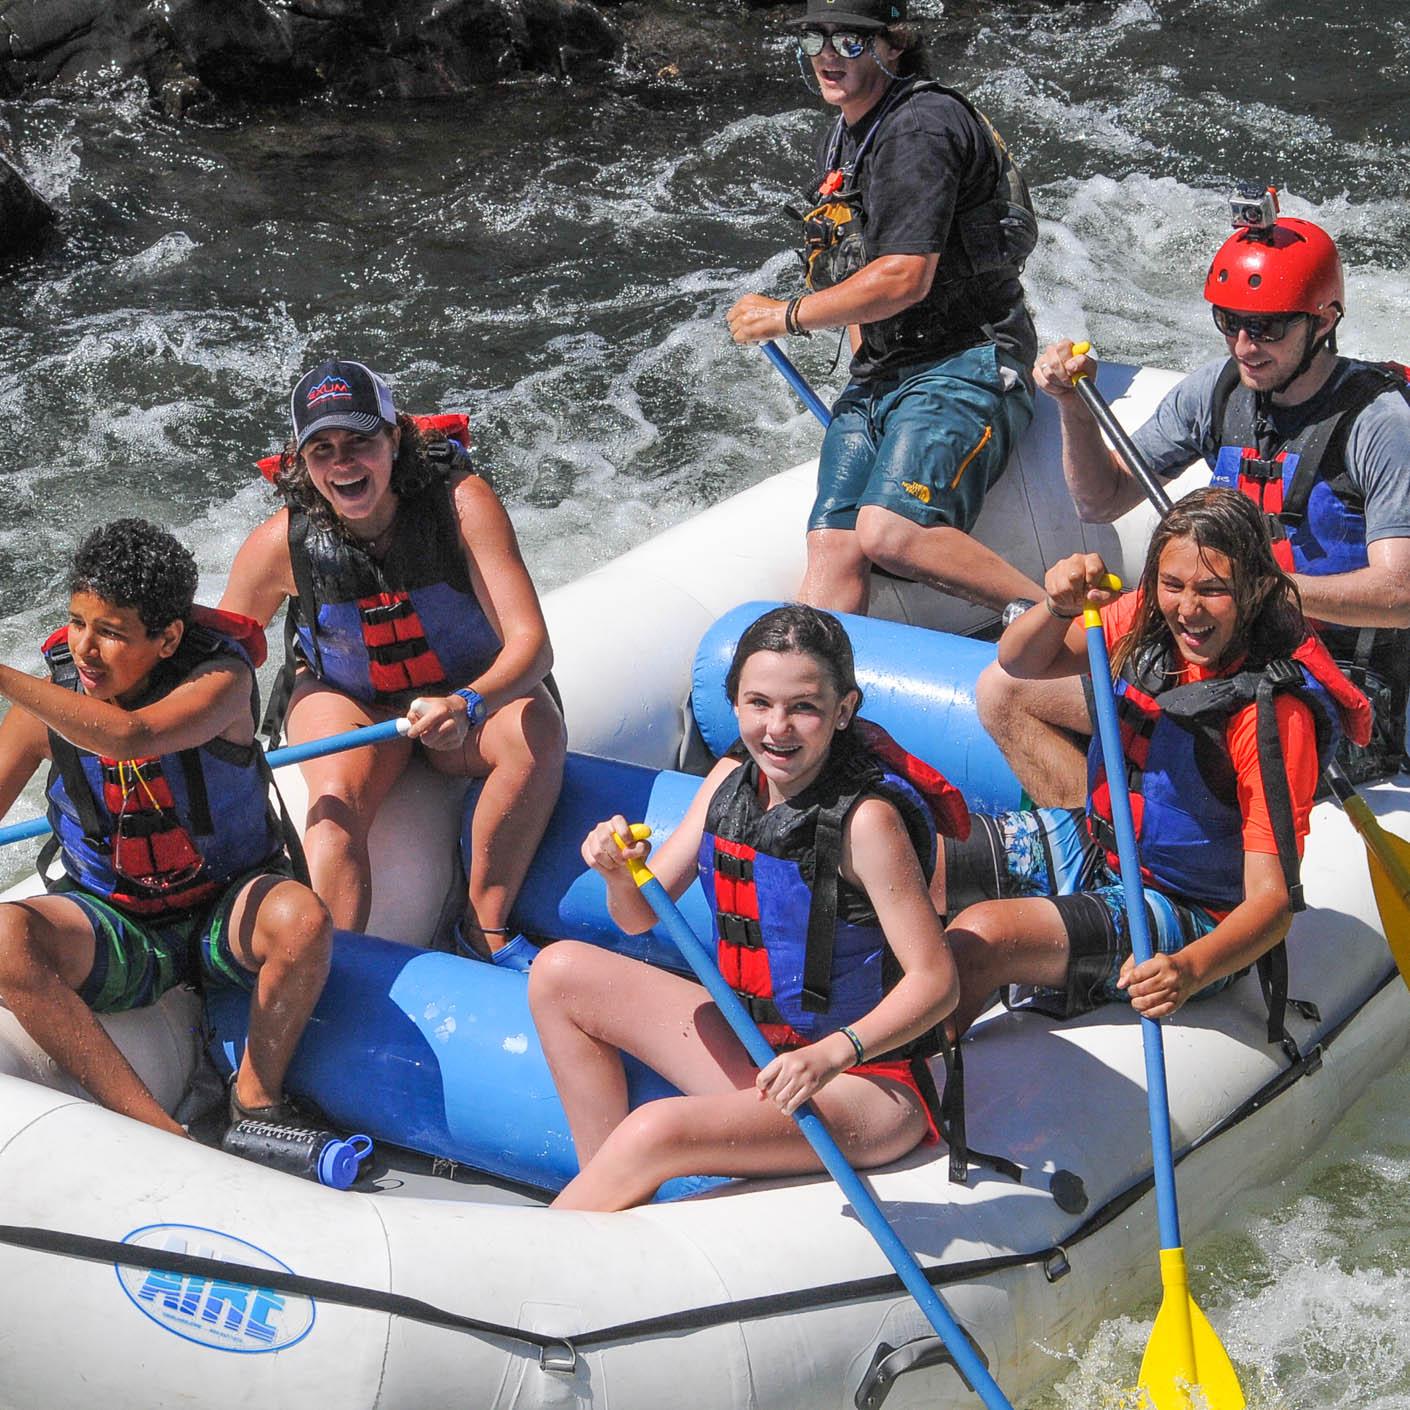 California Explorer whitewater rafting